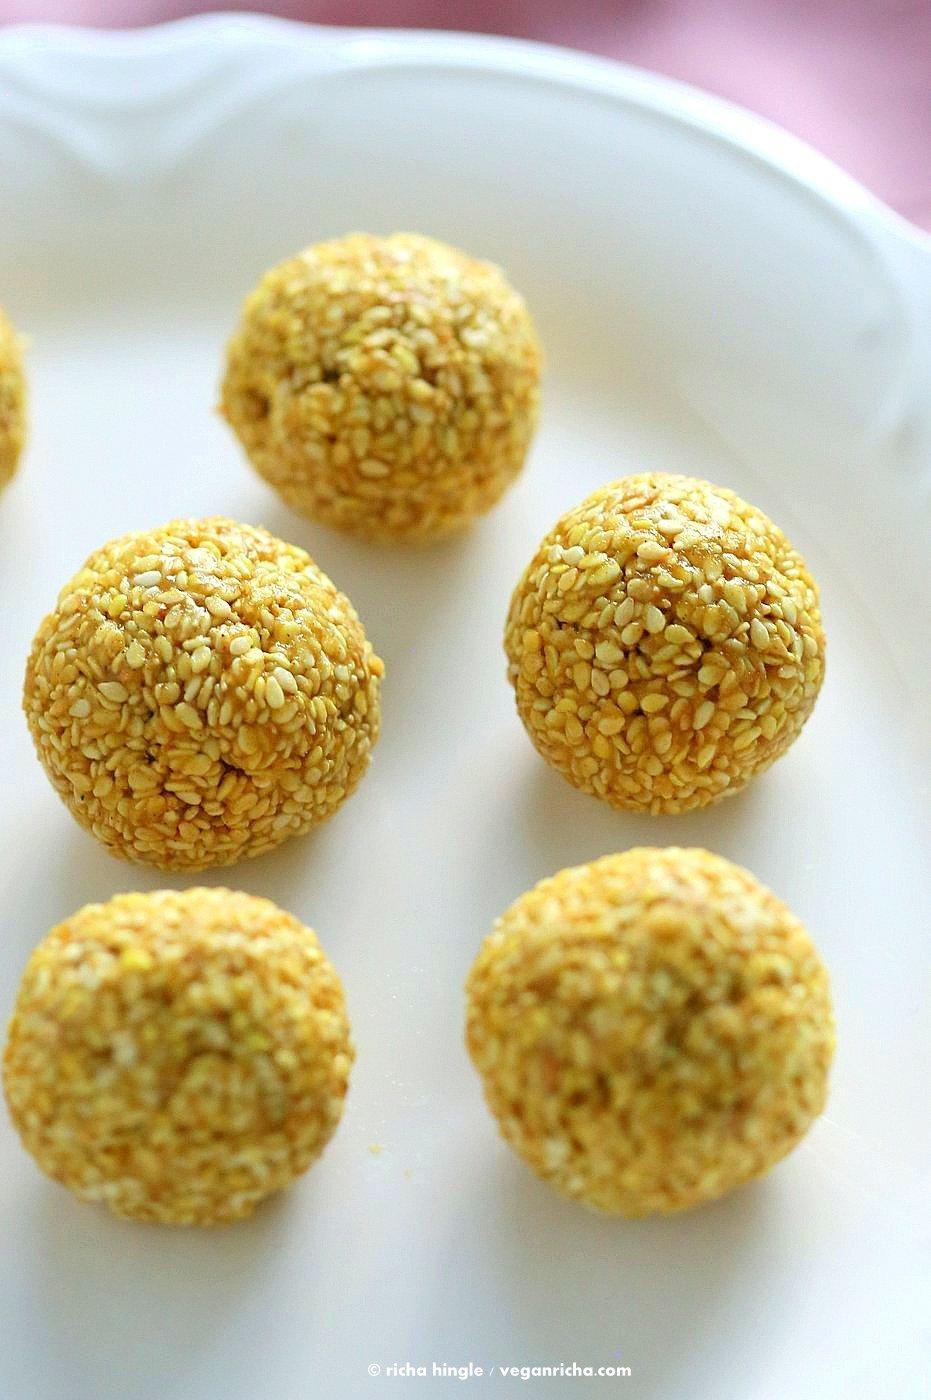 Golden Sesame Balls. Turmeric Toasted Sesame balls with Cinnamon and Cardamom. 5 Ingredient Sesame balls, or make them into bars or protein sesame bars. Vegan Gluten-free Nut-free Recipe | VeganRicha.com